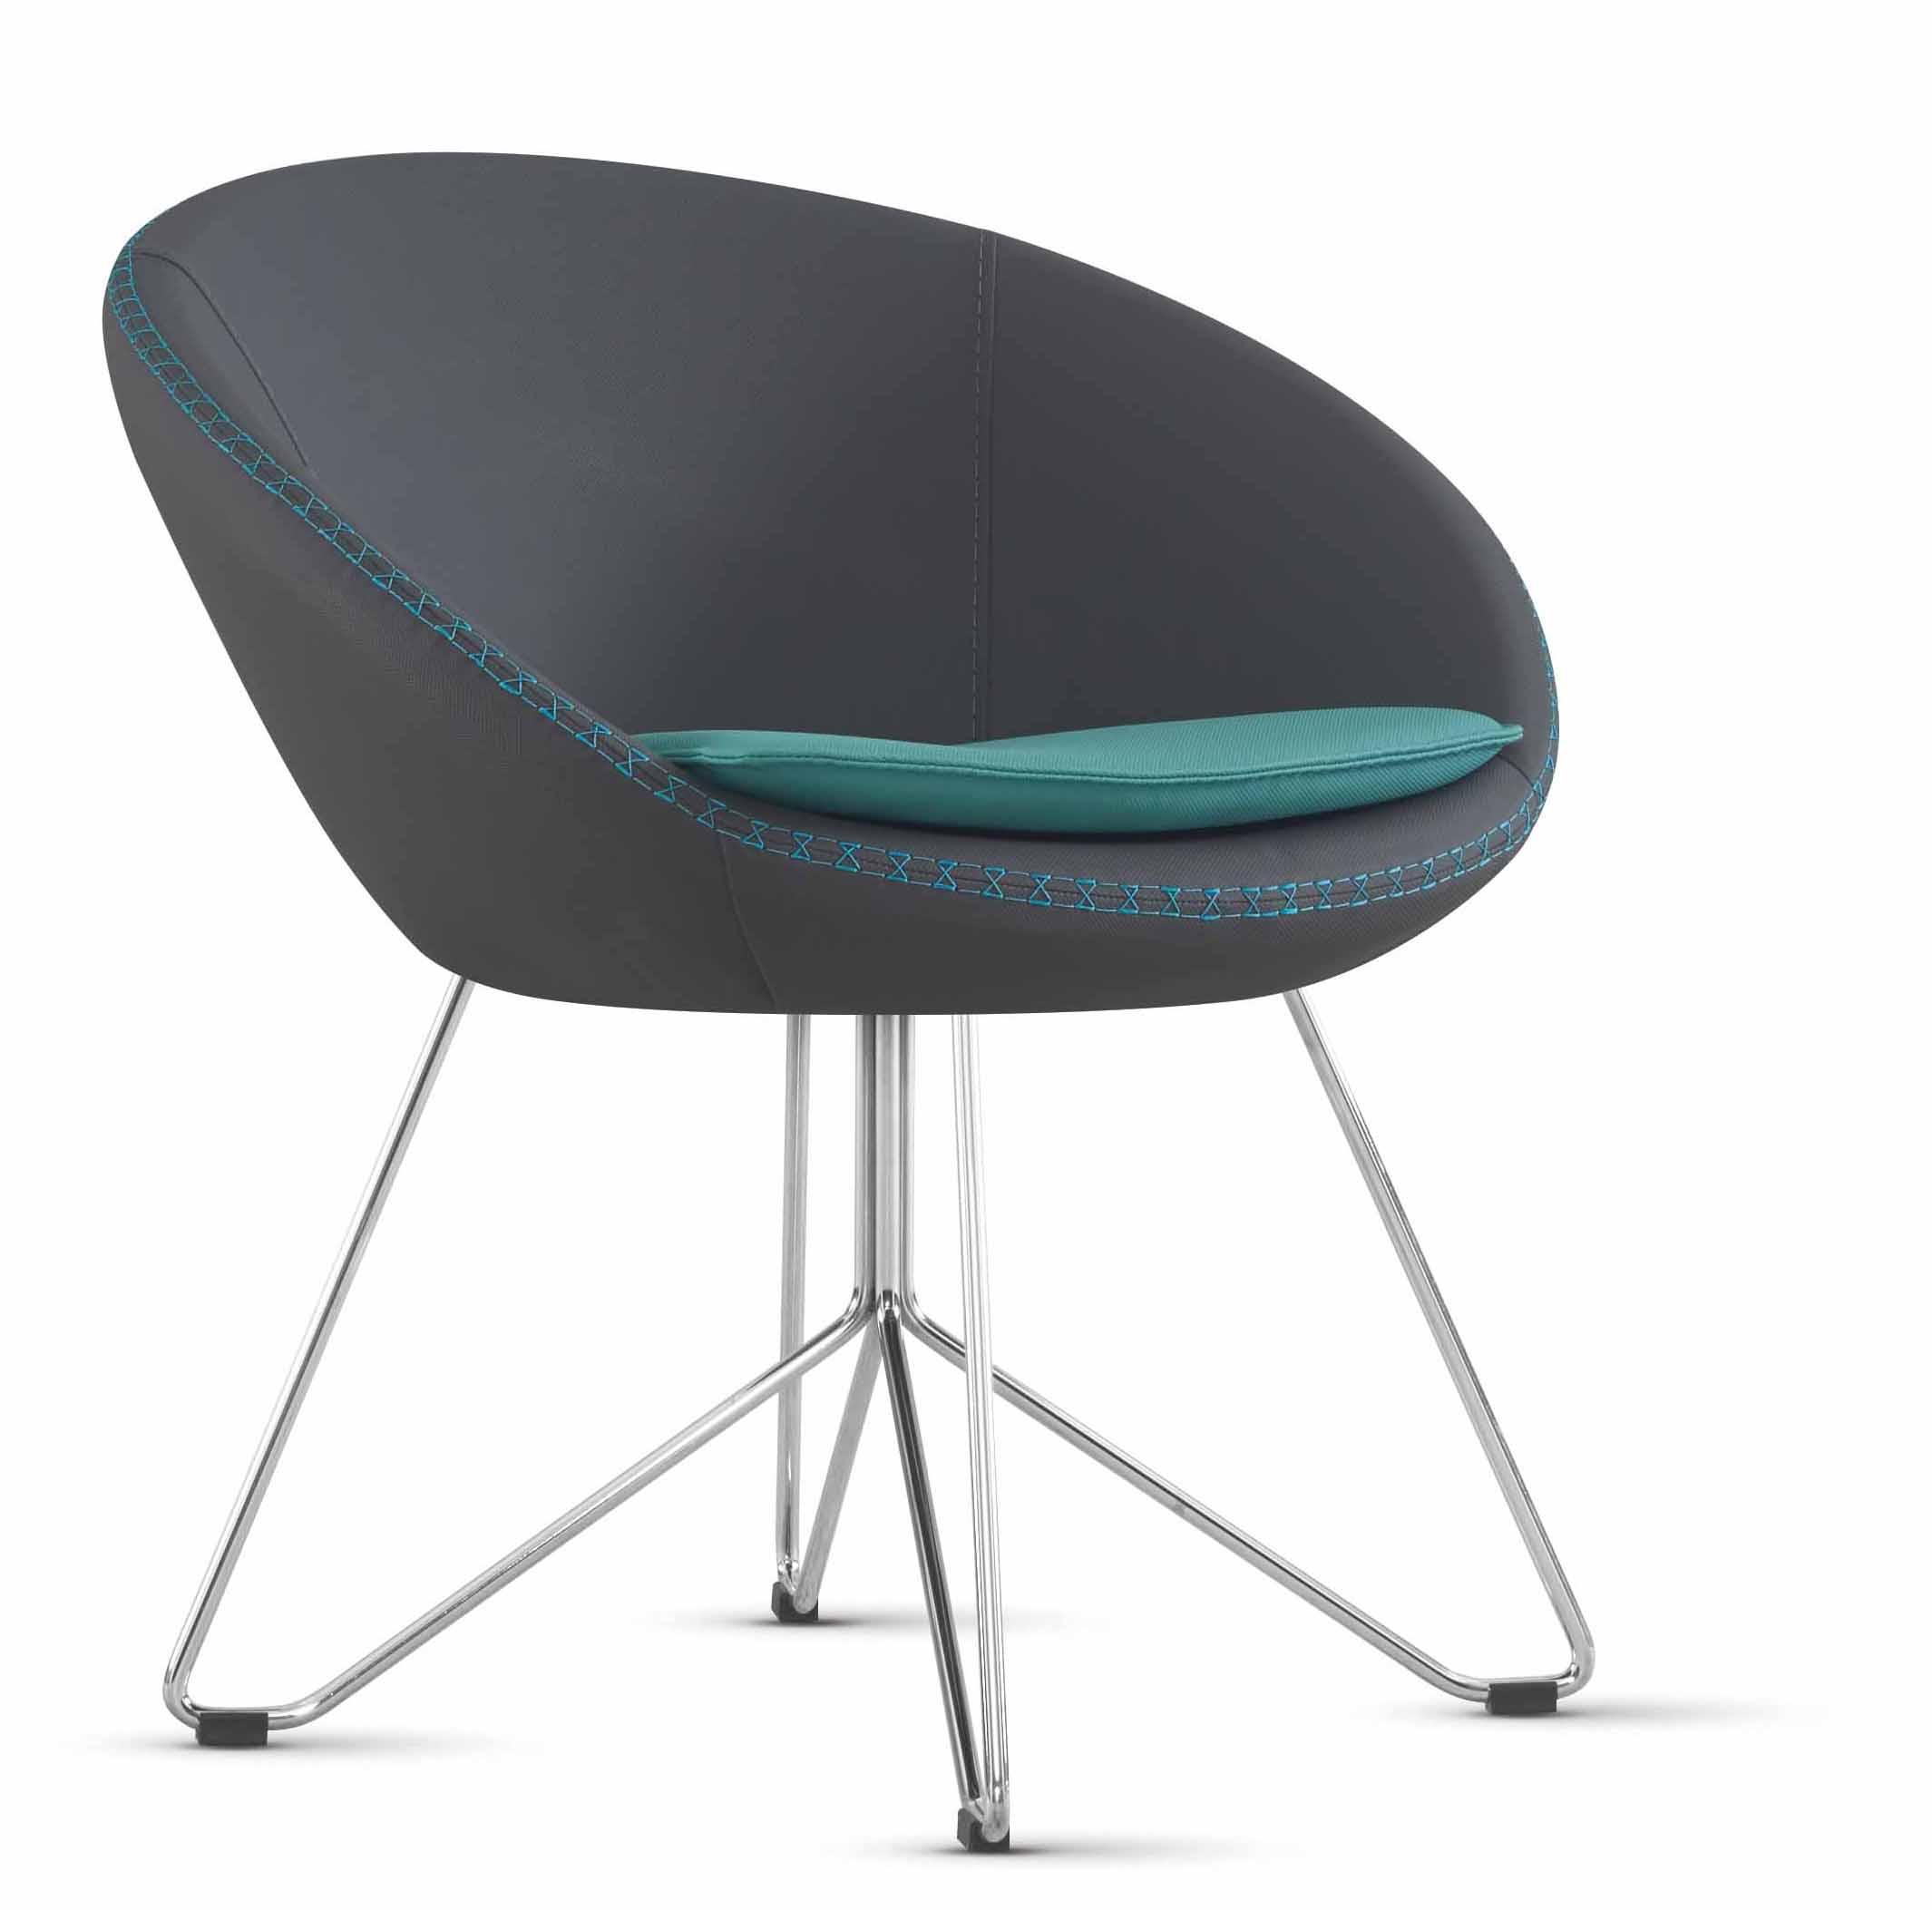 Designer Bürostühle designer bürostuhl schwarz mit metallfuß nicht drehbar möbel